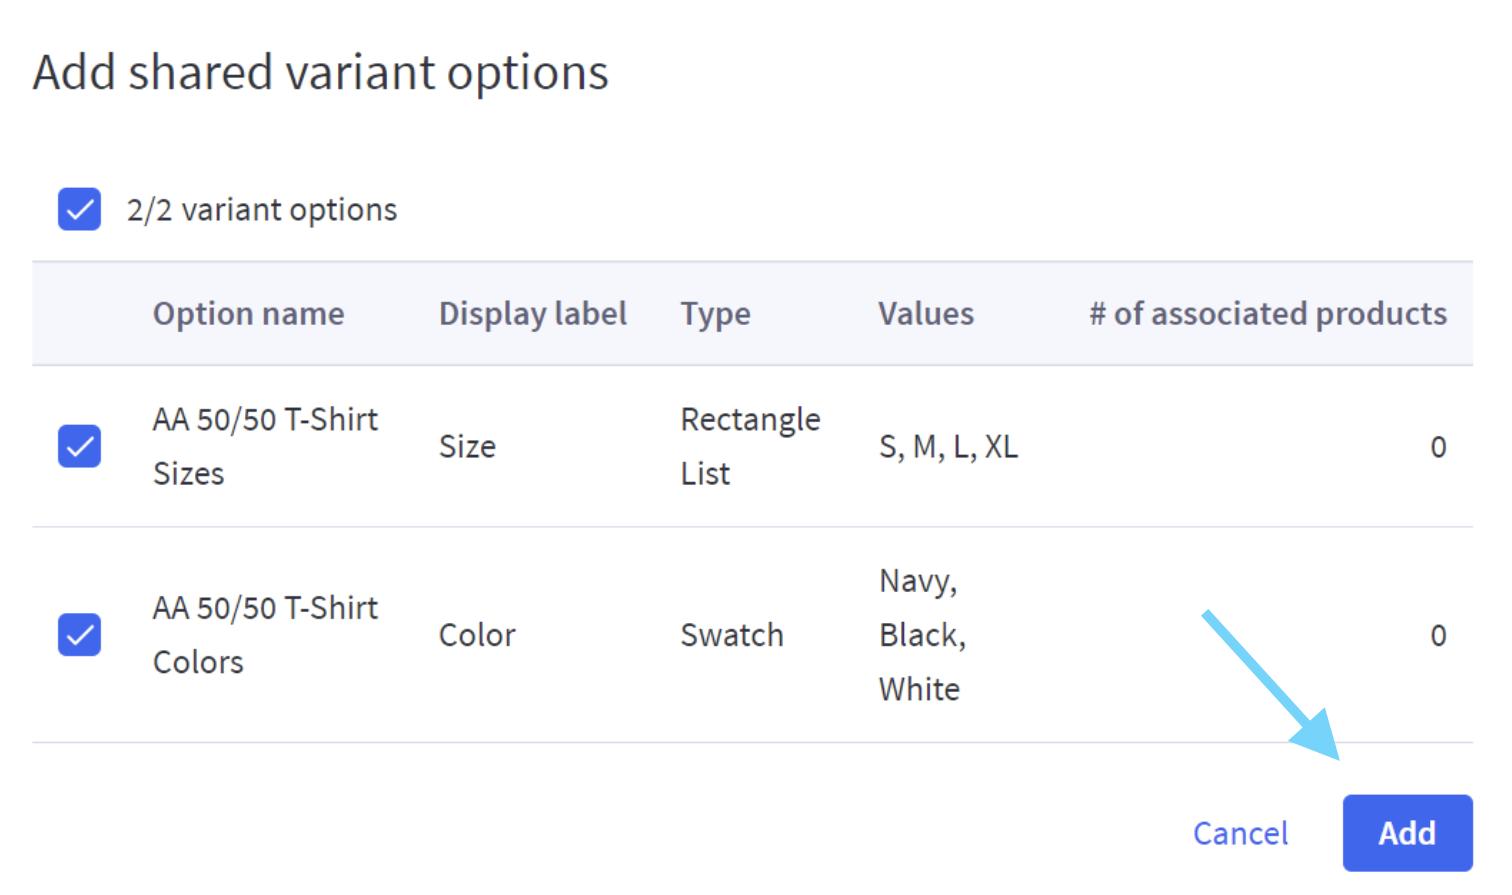 Add shared variant option tab